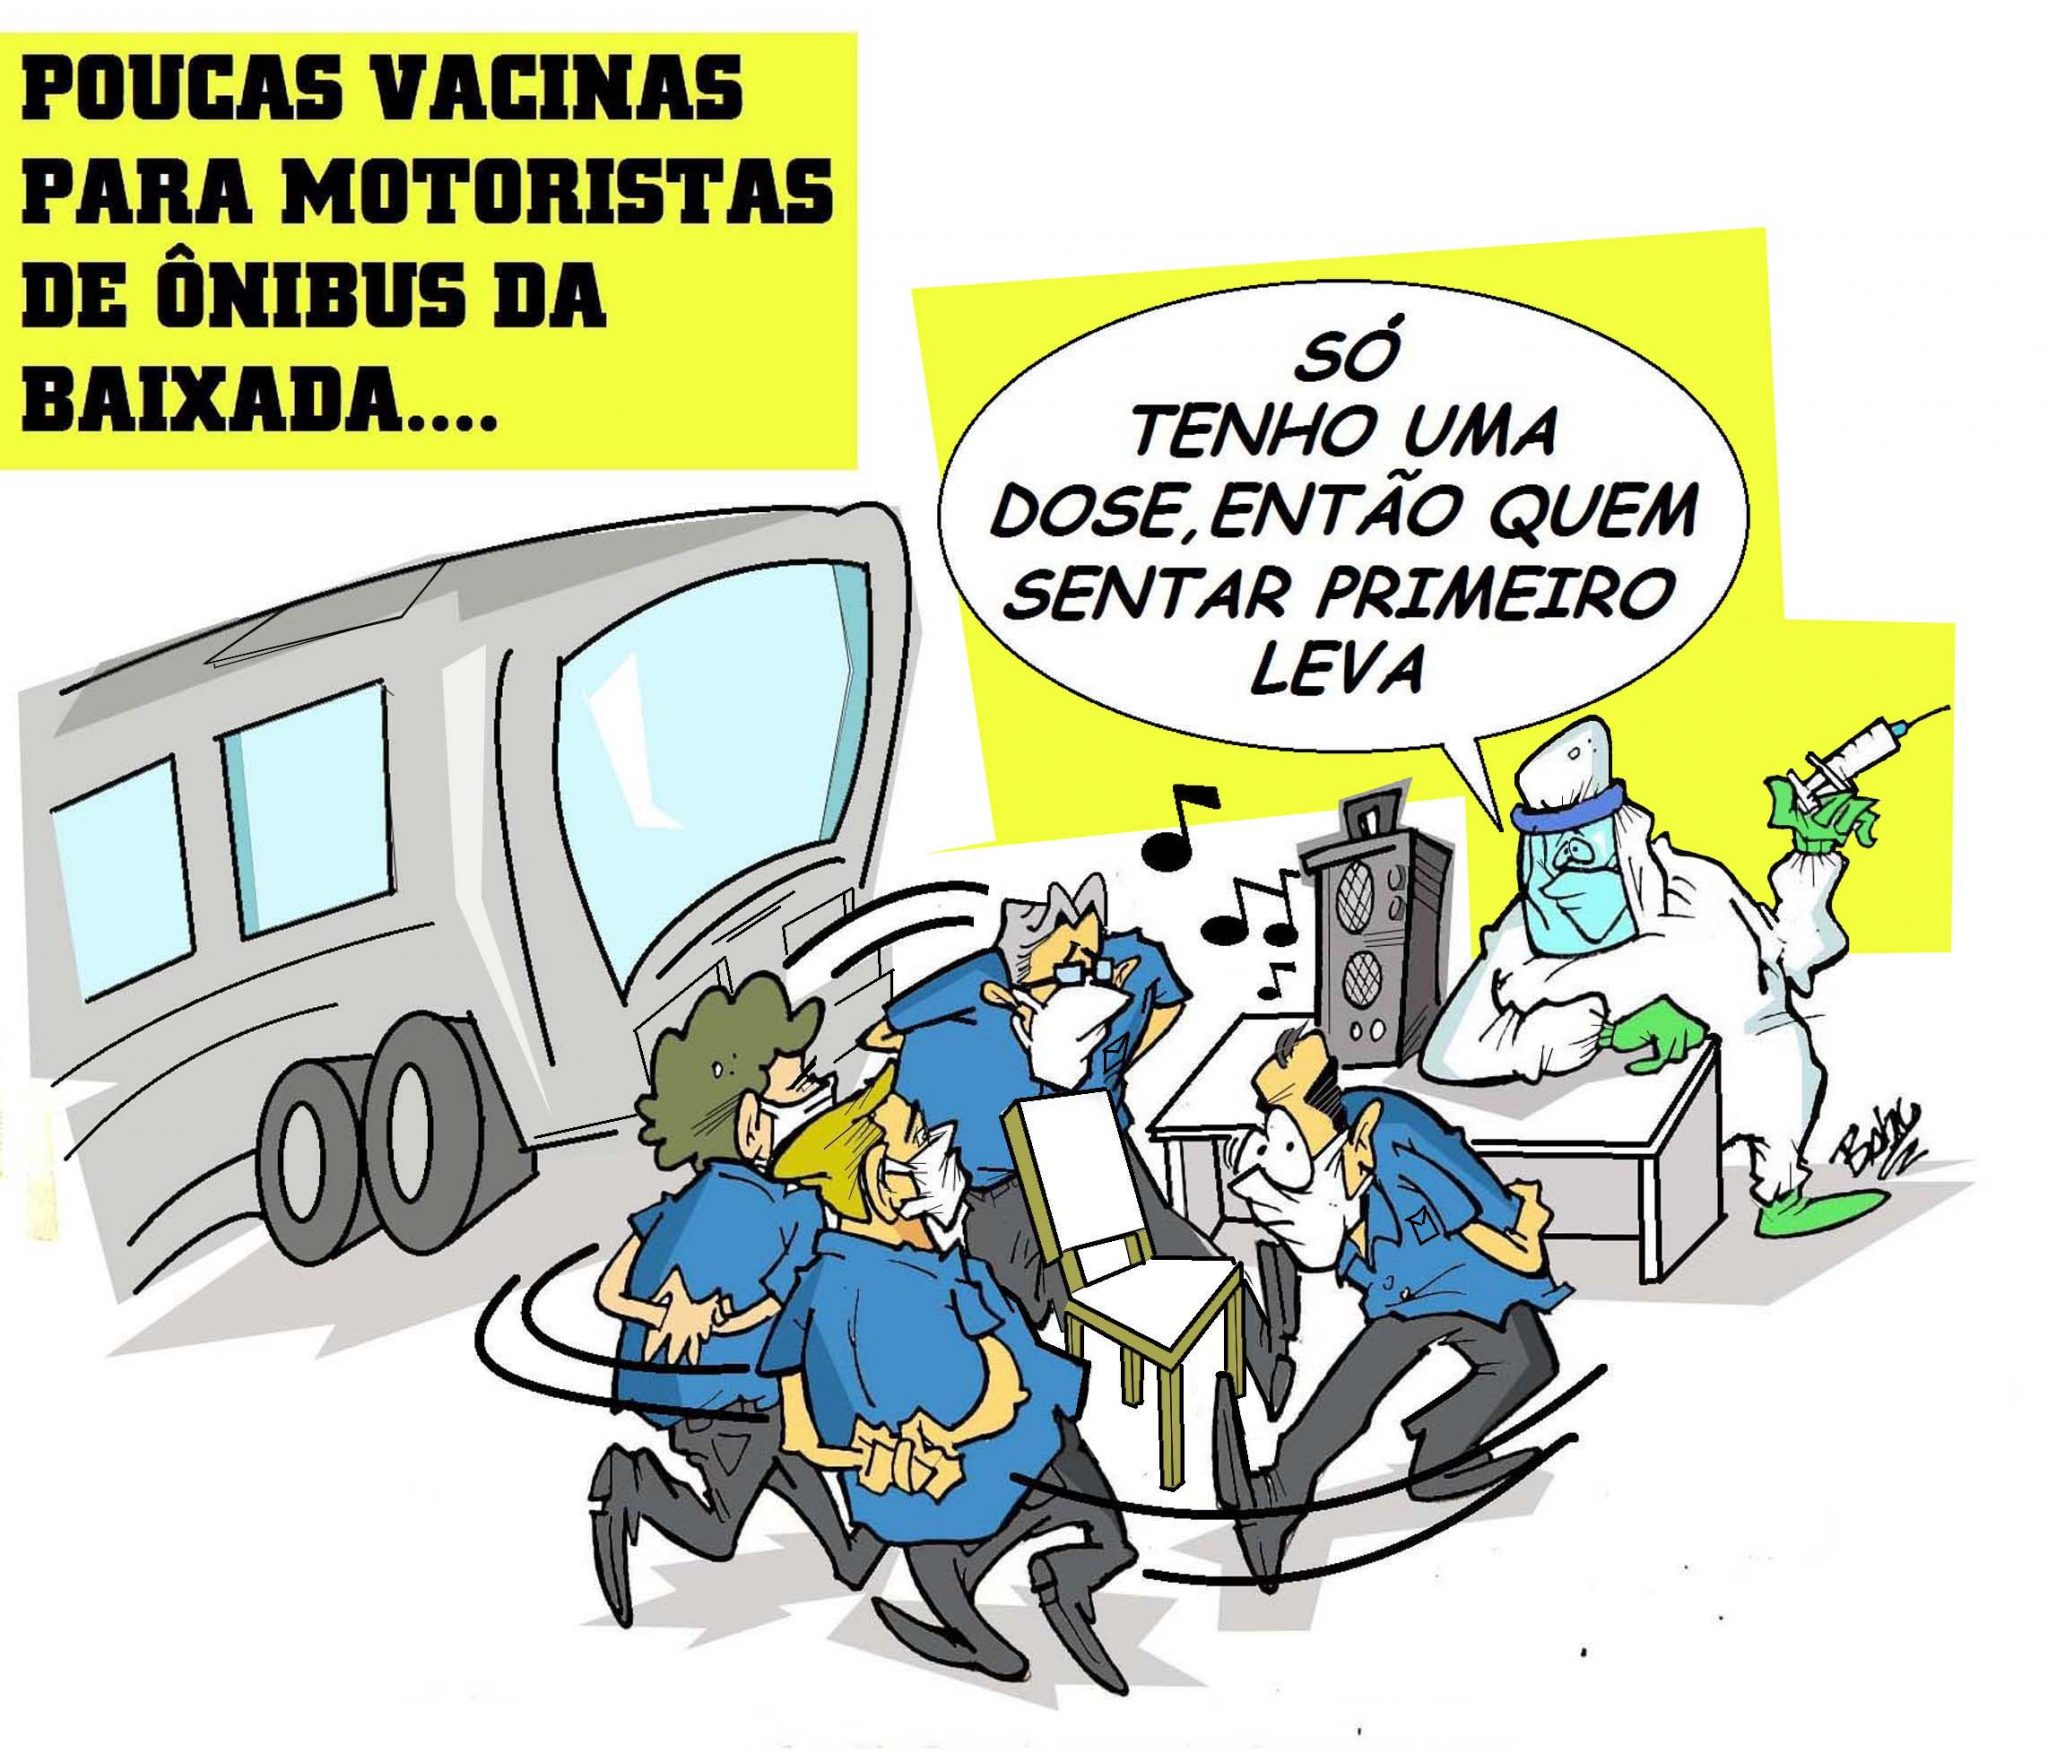 Vacinação motoristas fail